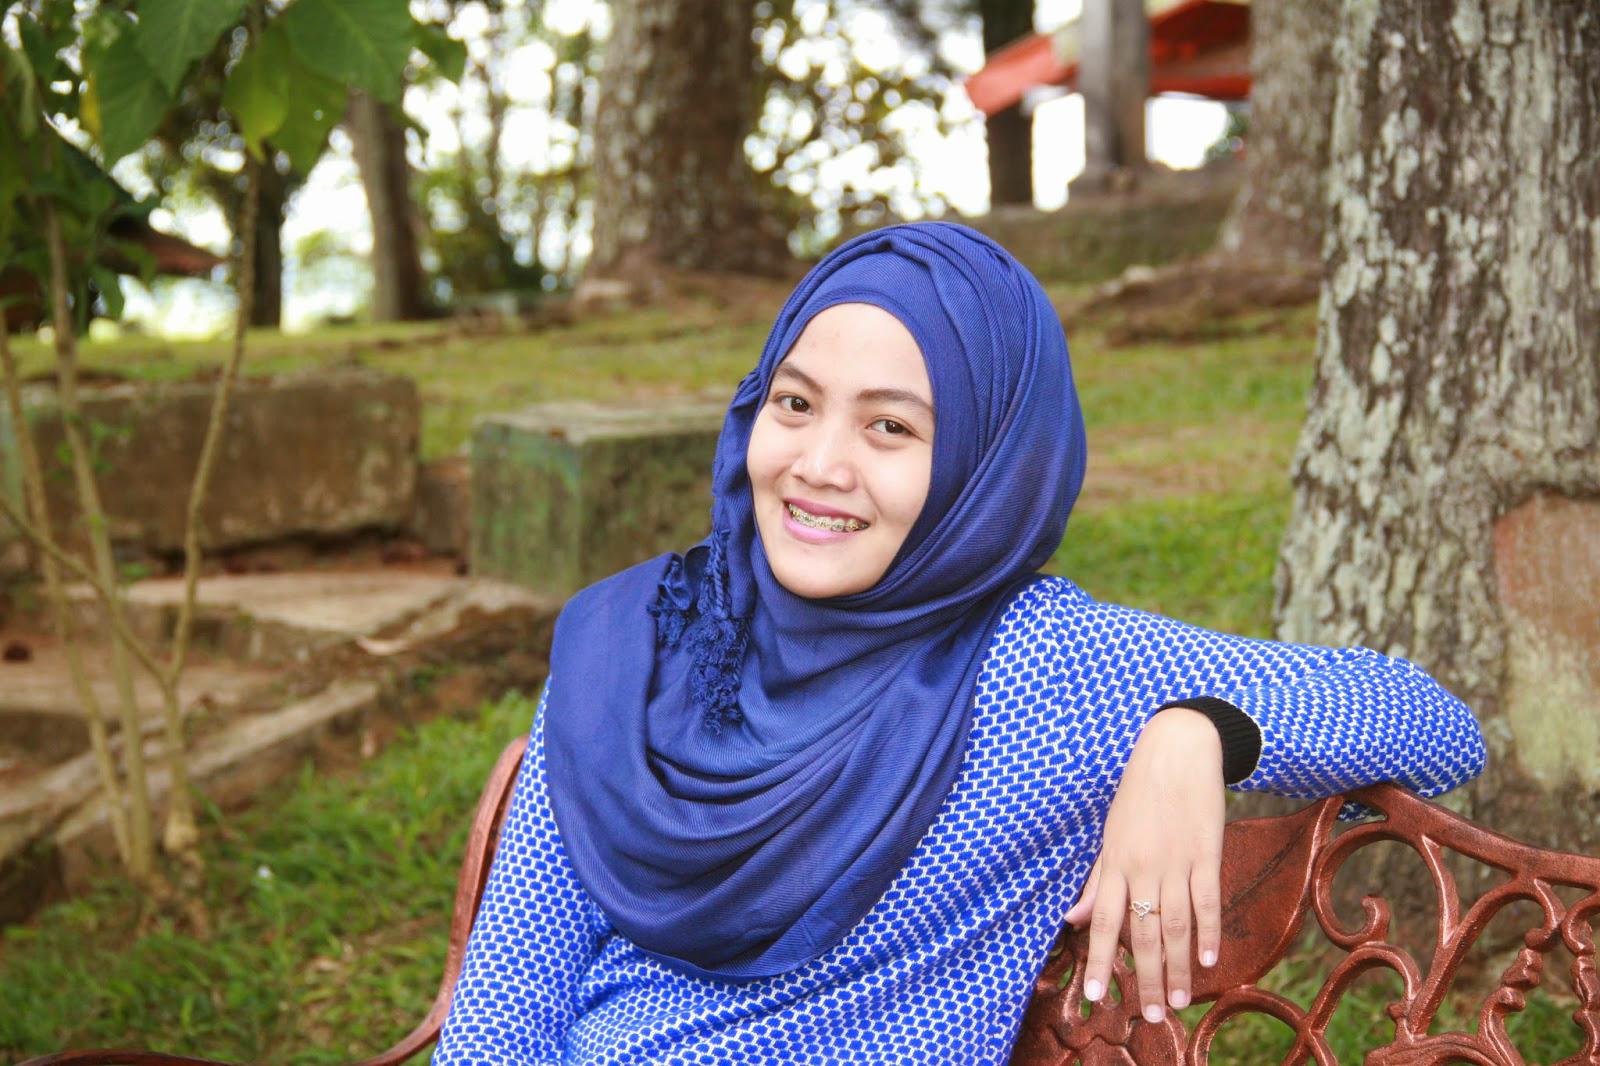 6 tutorial hijab Cewek IGO Efrida Yanti segi empat praktis bahan paris 6 tutorial hijab Cewek IGO Efrida Yanti dasar cocok untuk pemula